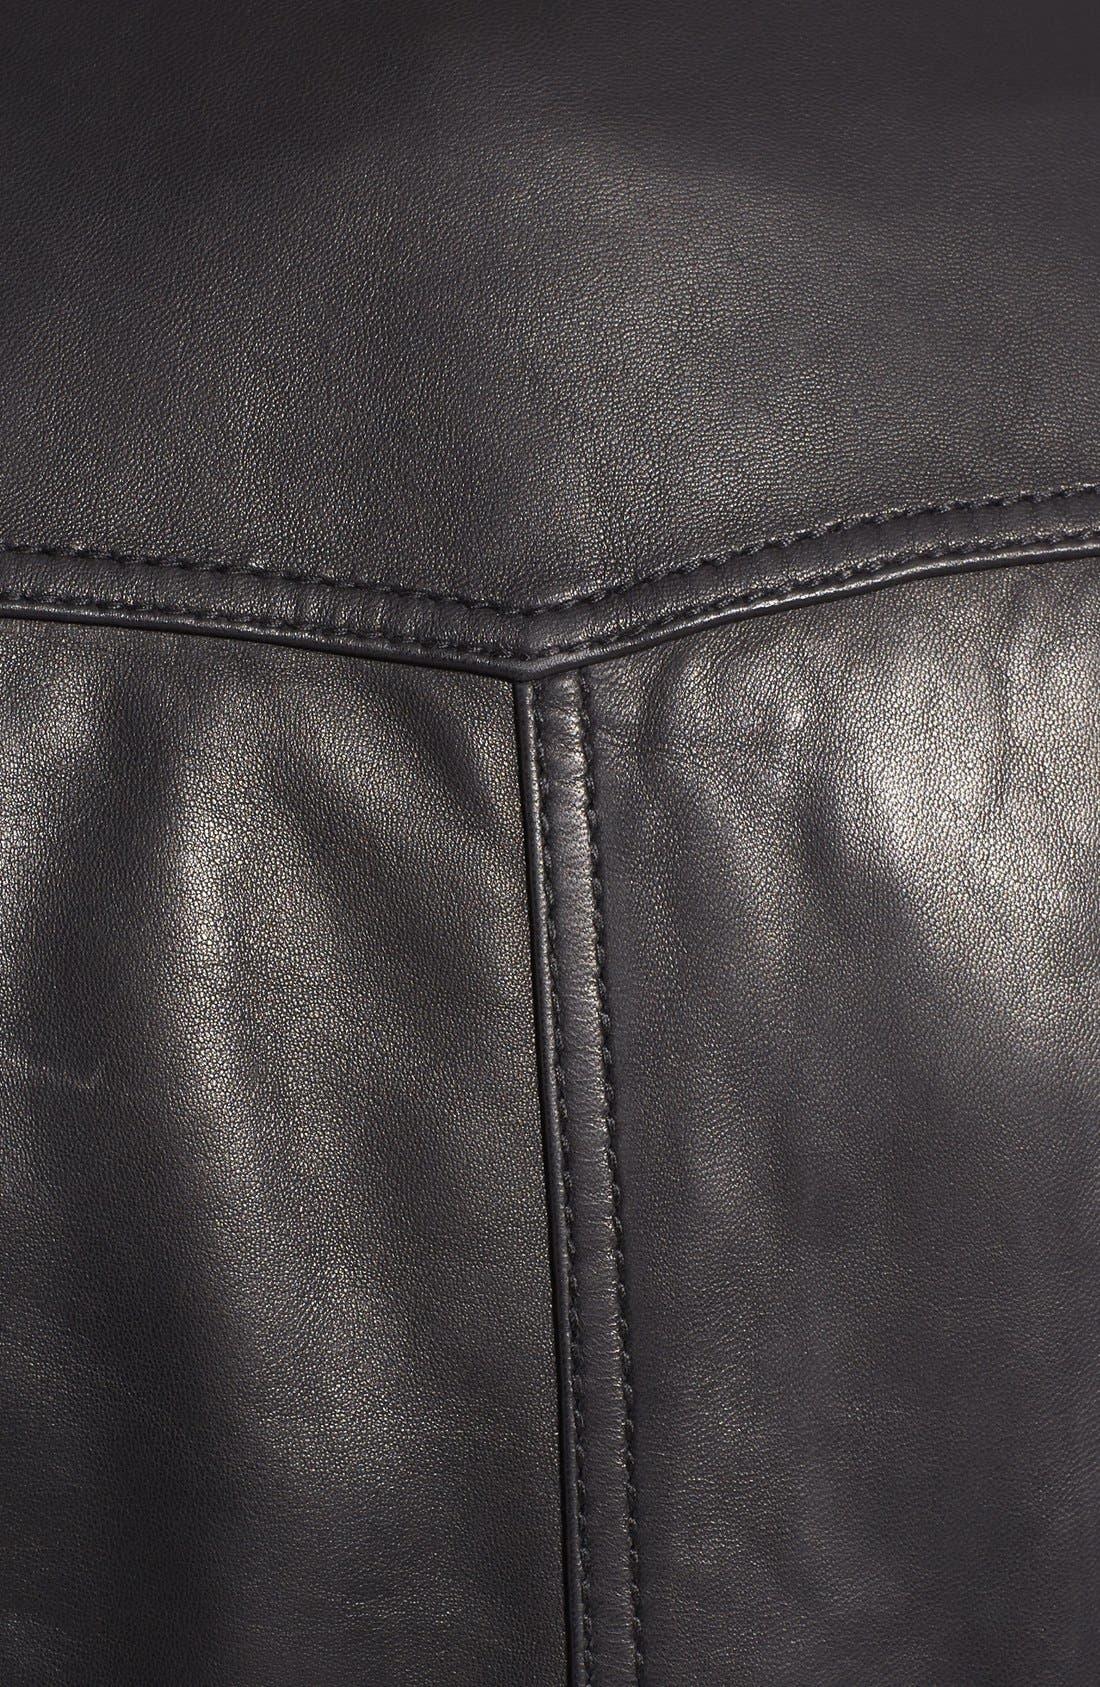 Front Zip Leather Jacket,                             Alternate thumbnail 5, color,                             001